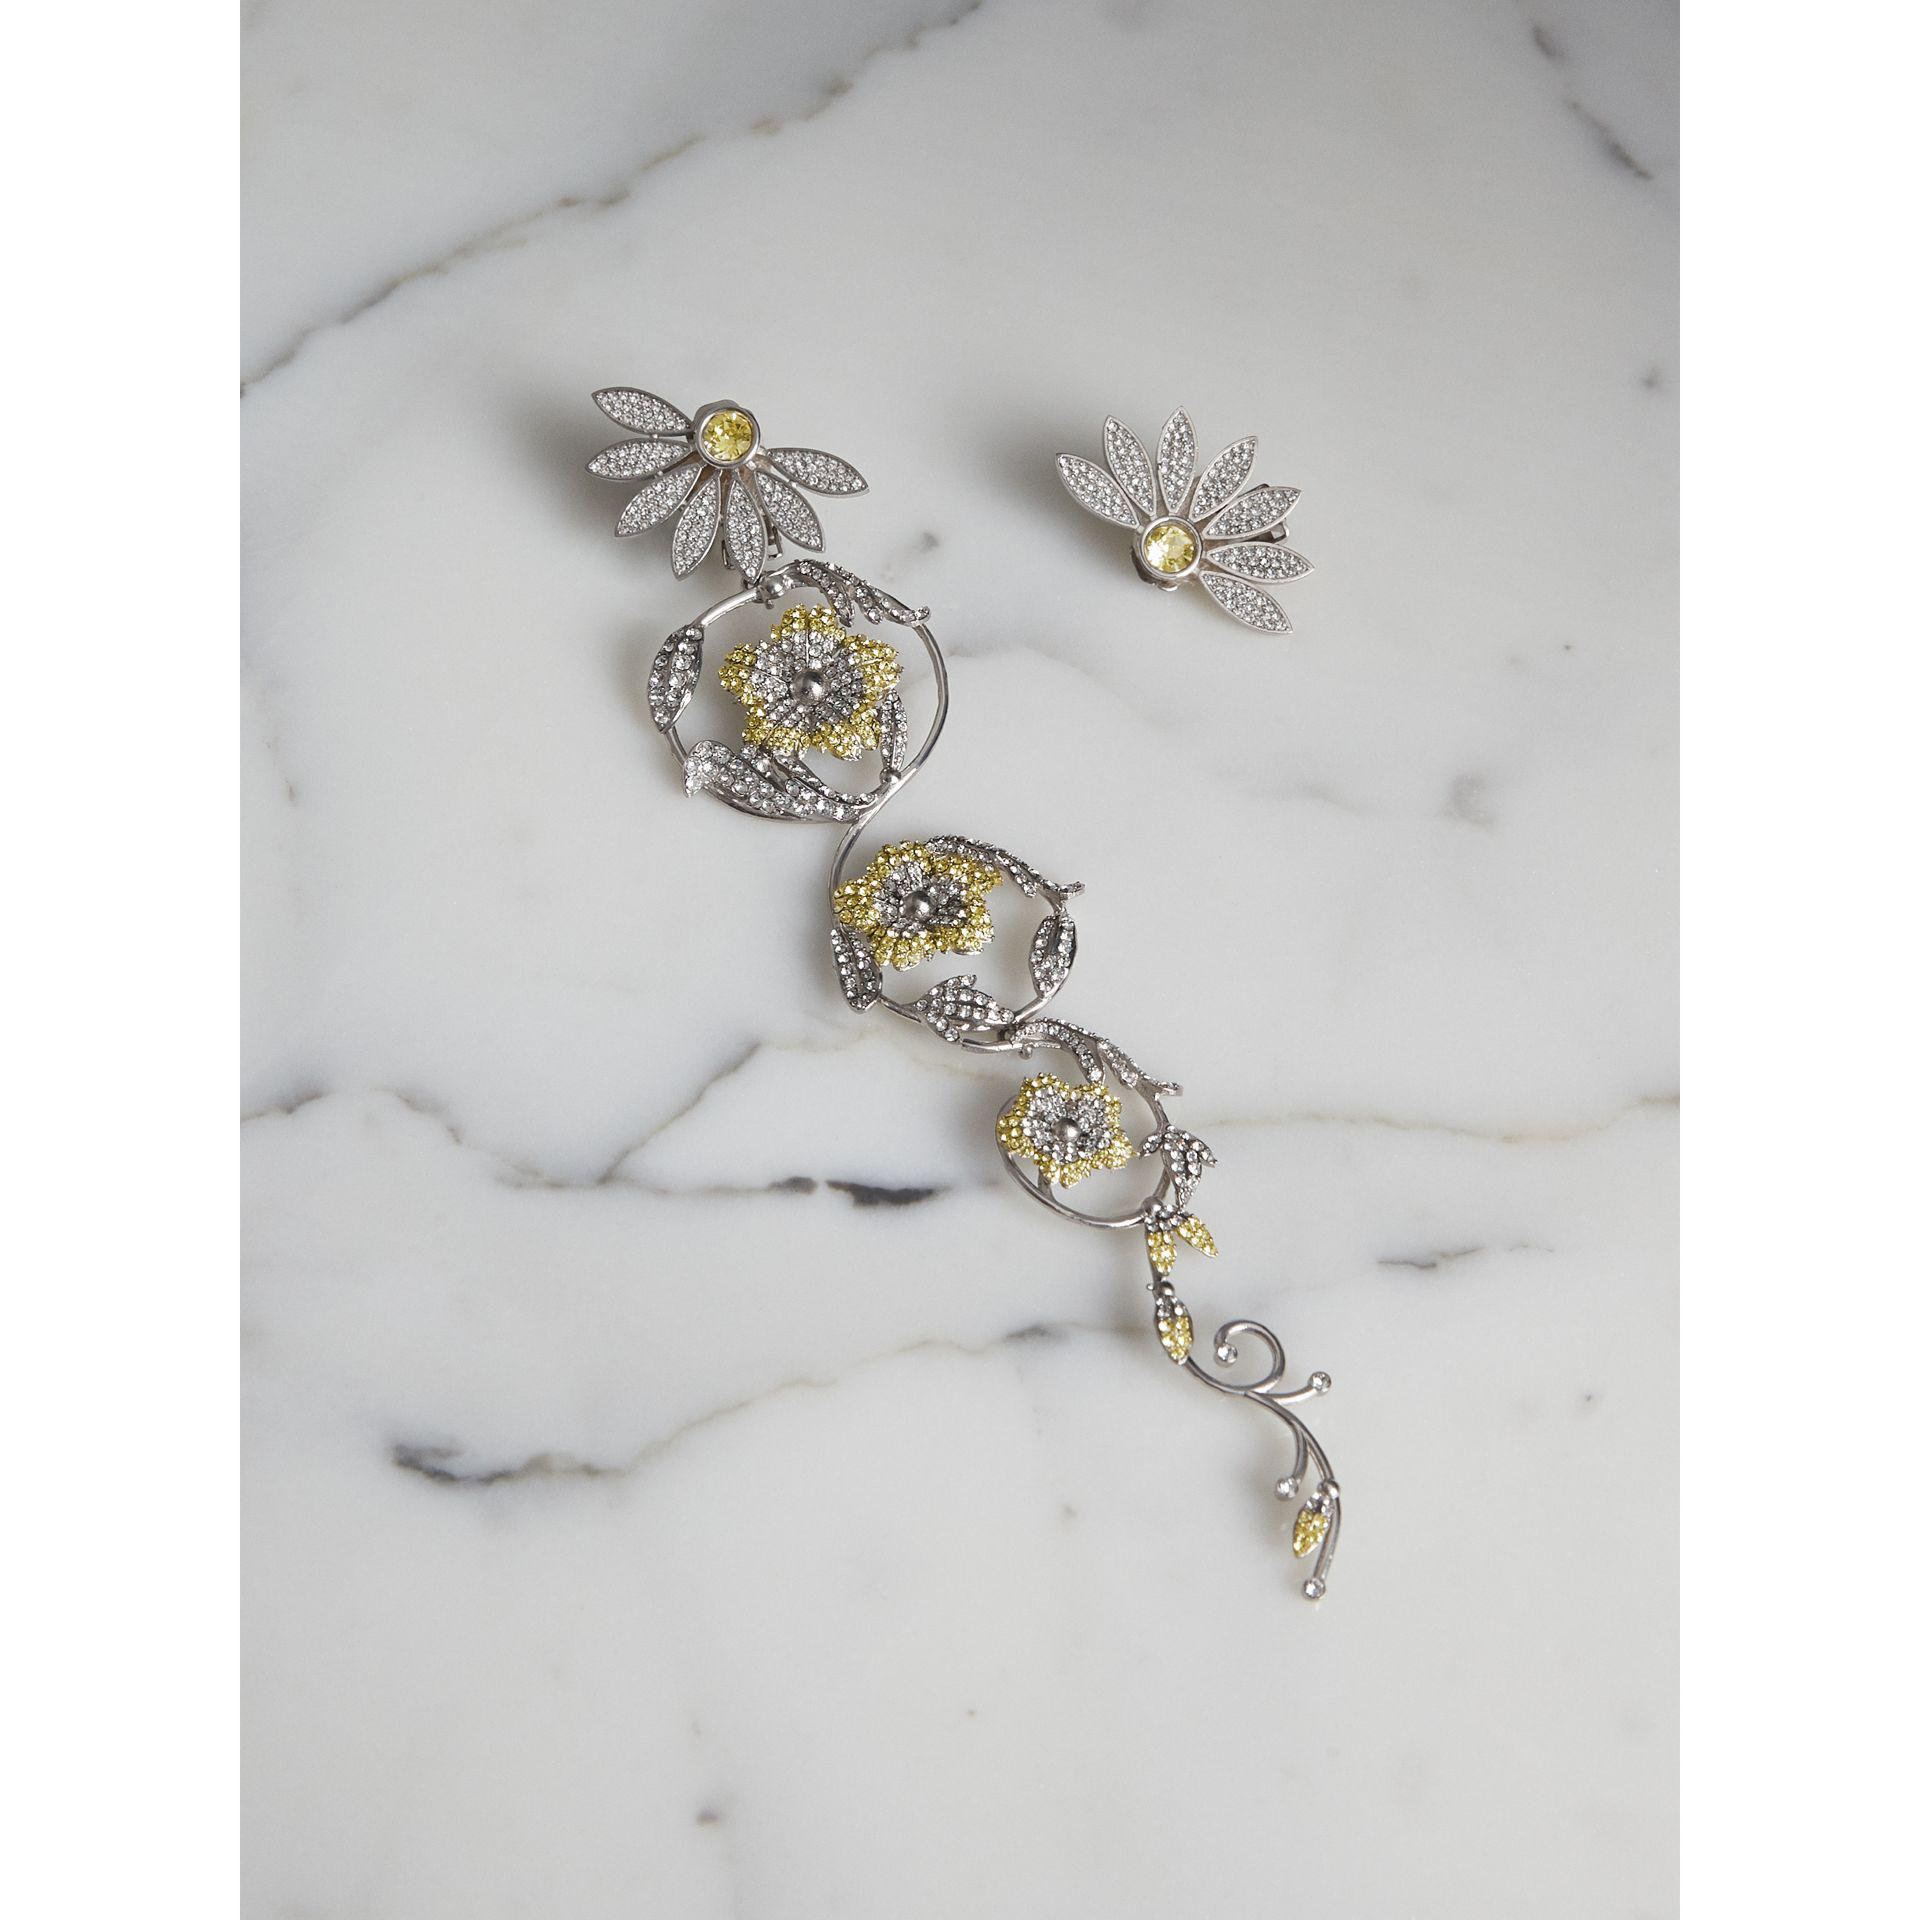 Burberry Asymetric Half-Daisy Drop Earrings in Peridot Green Crystal and Metal 4tfFVZ